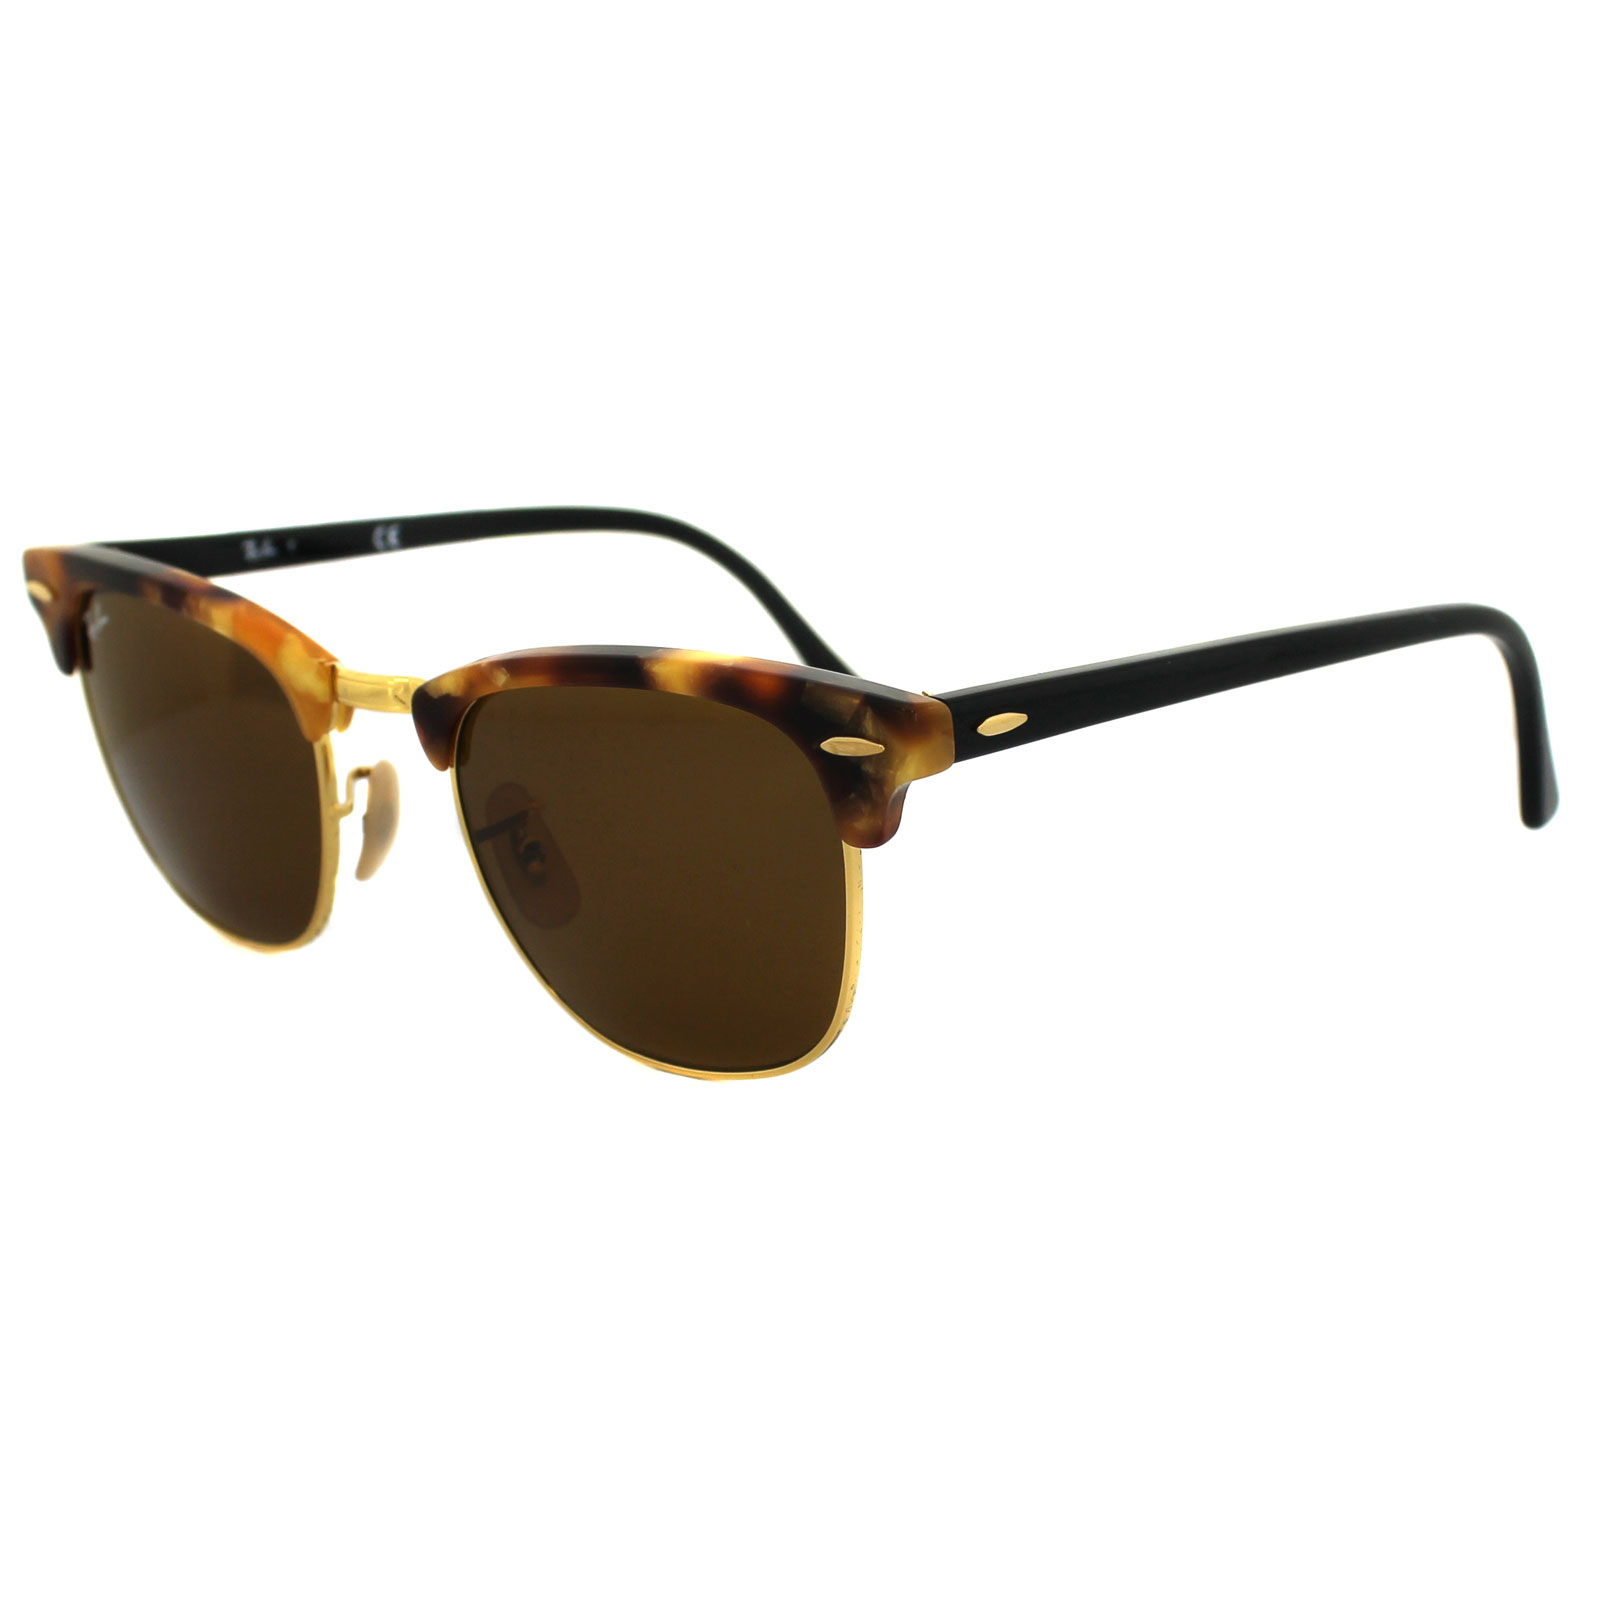 f17087c69f2 Ray-Ban Sunglasses Clubmaster 3016 1160 Fleck Tortoise   Black Brown